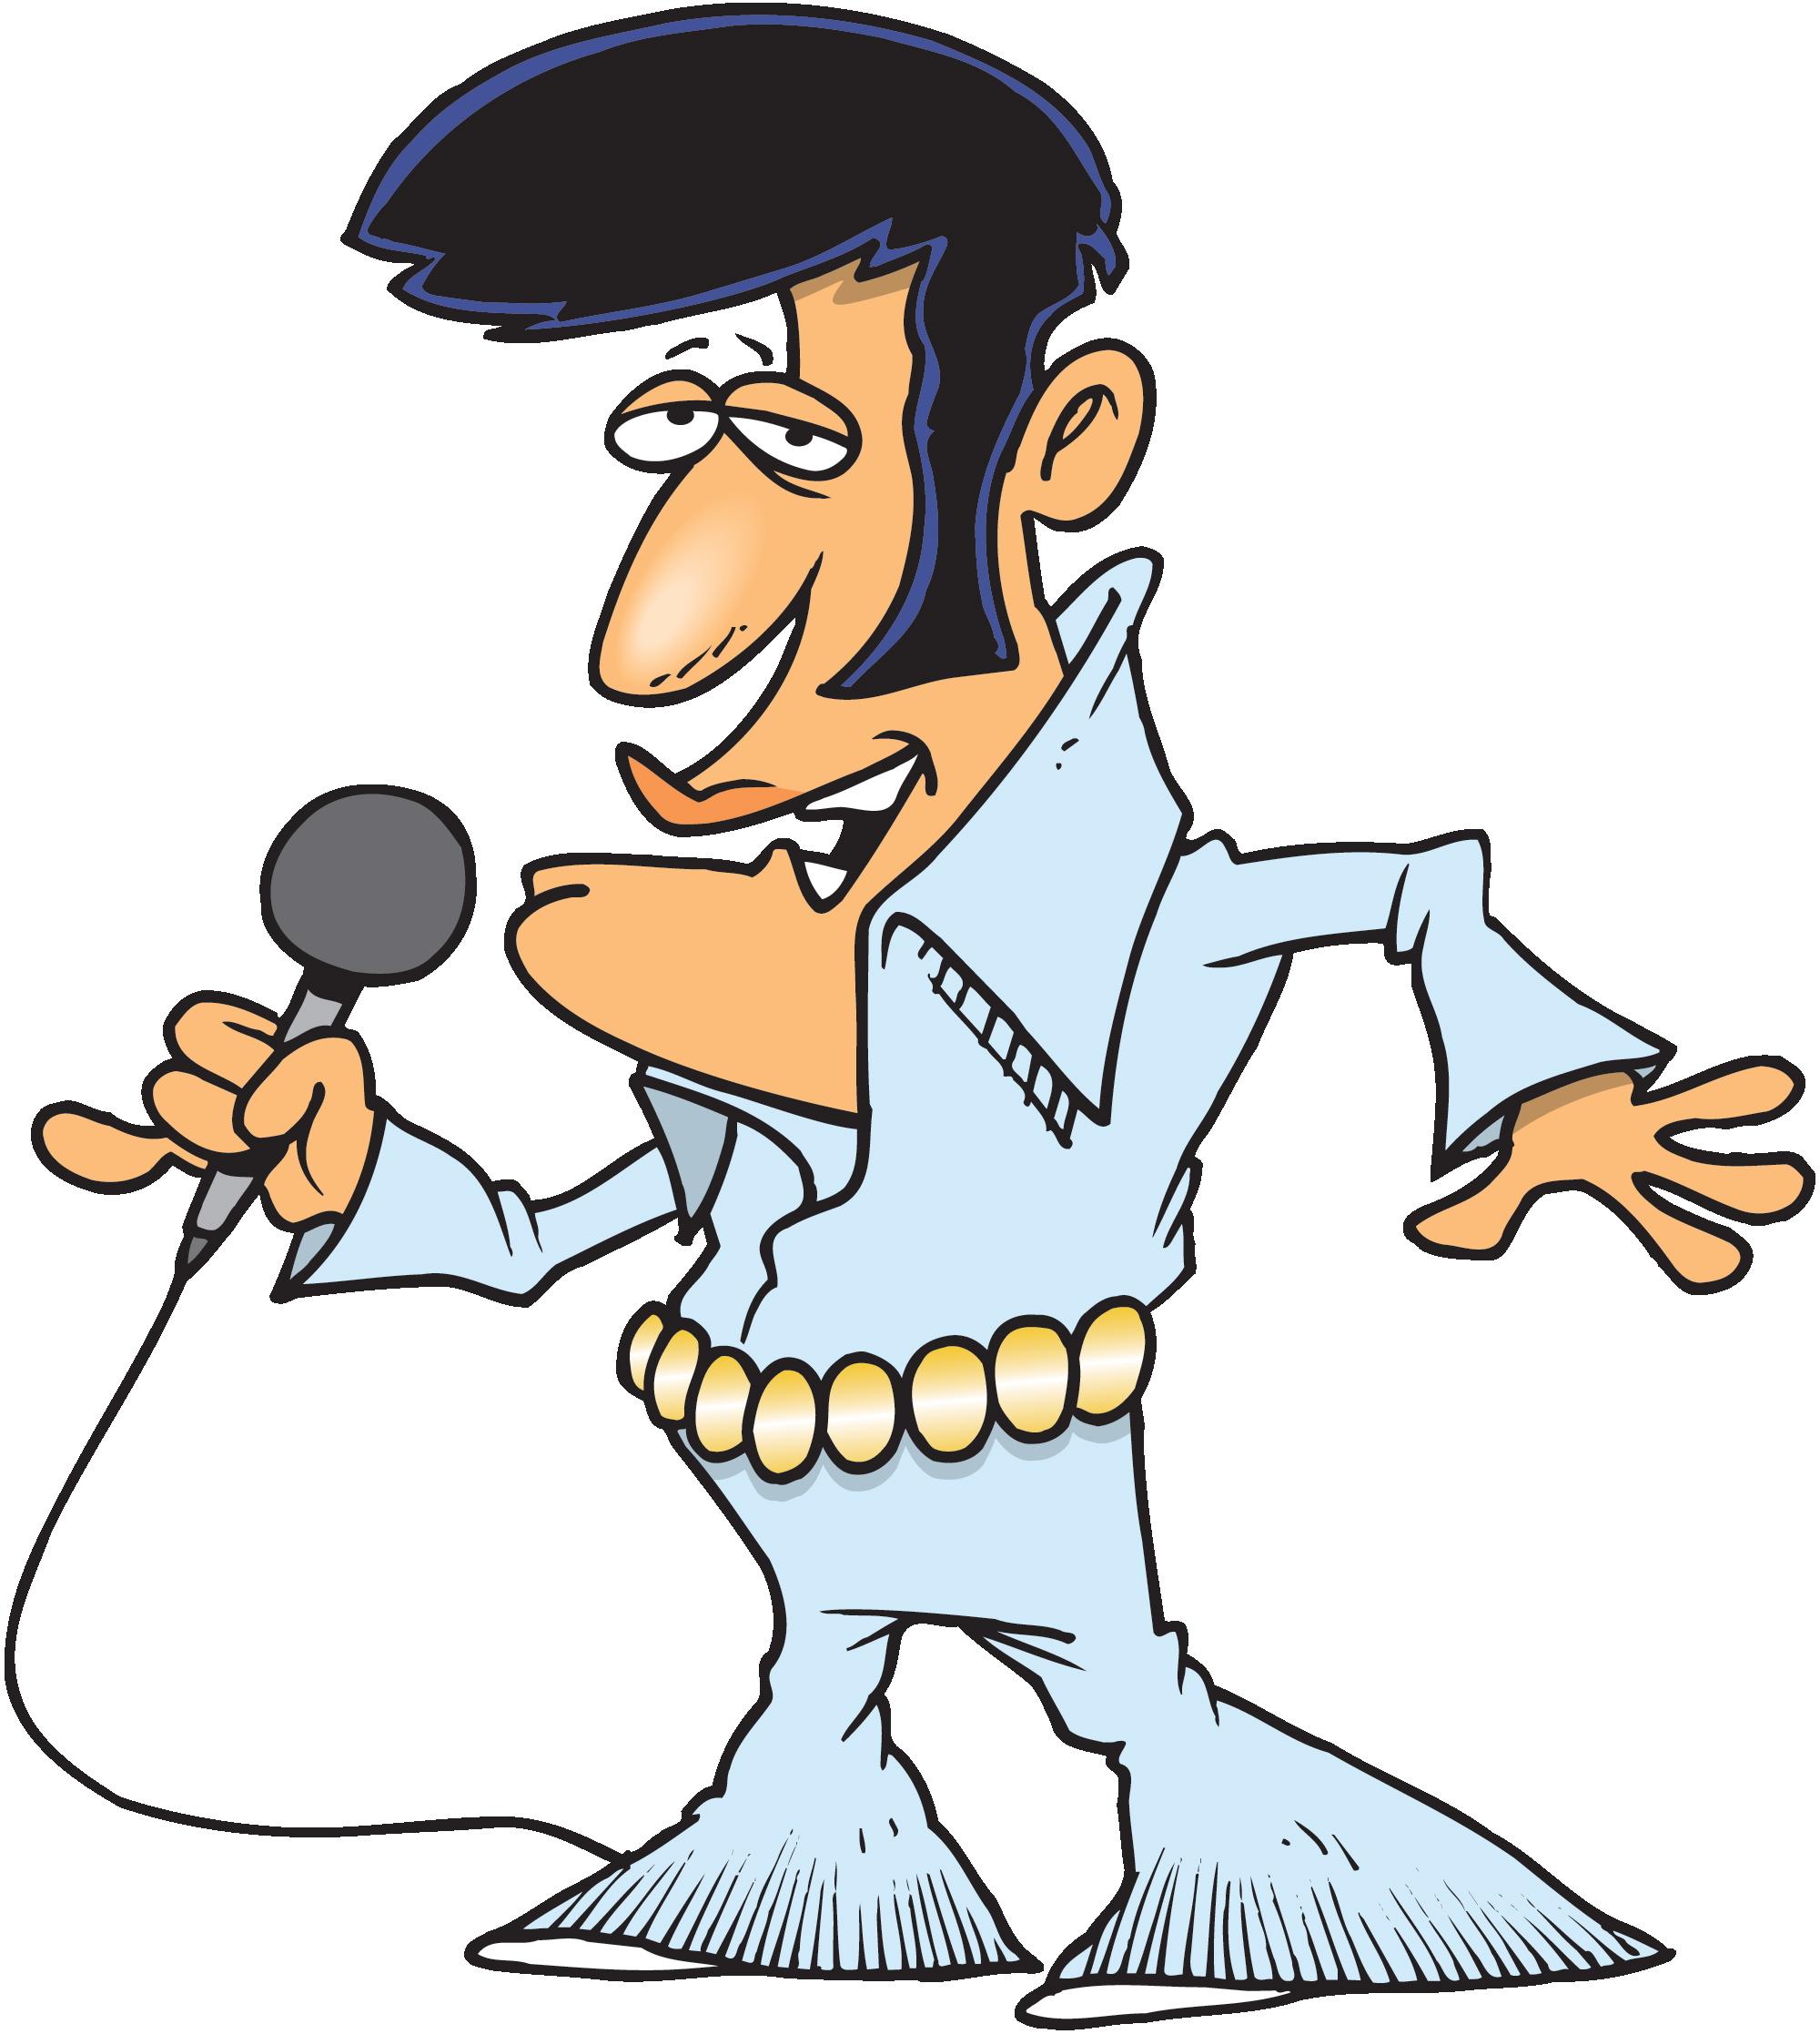 Caricature clipart Clipart Download Caricature Caricature Elvis